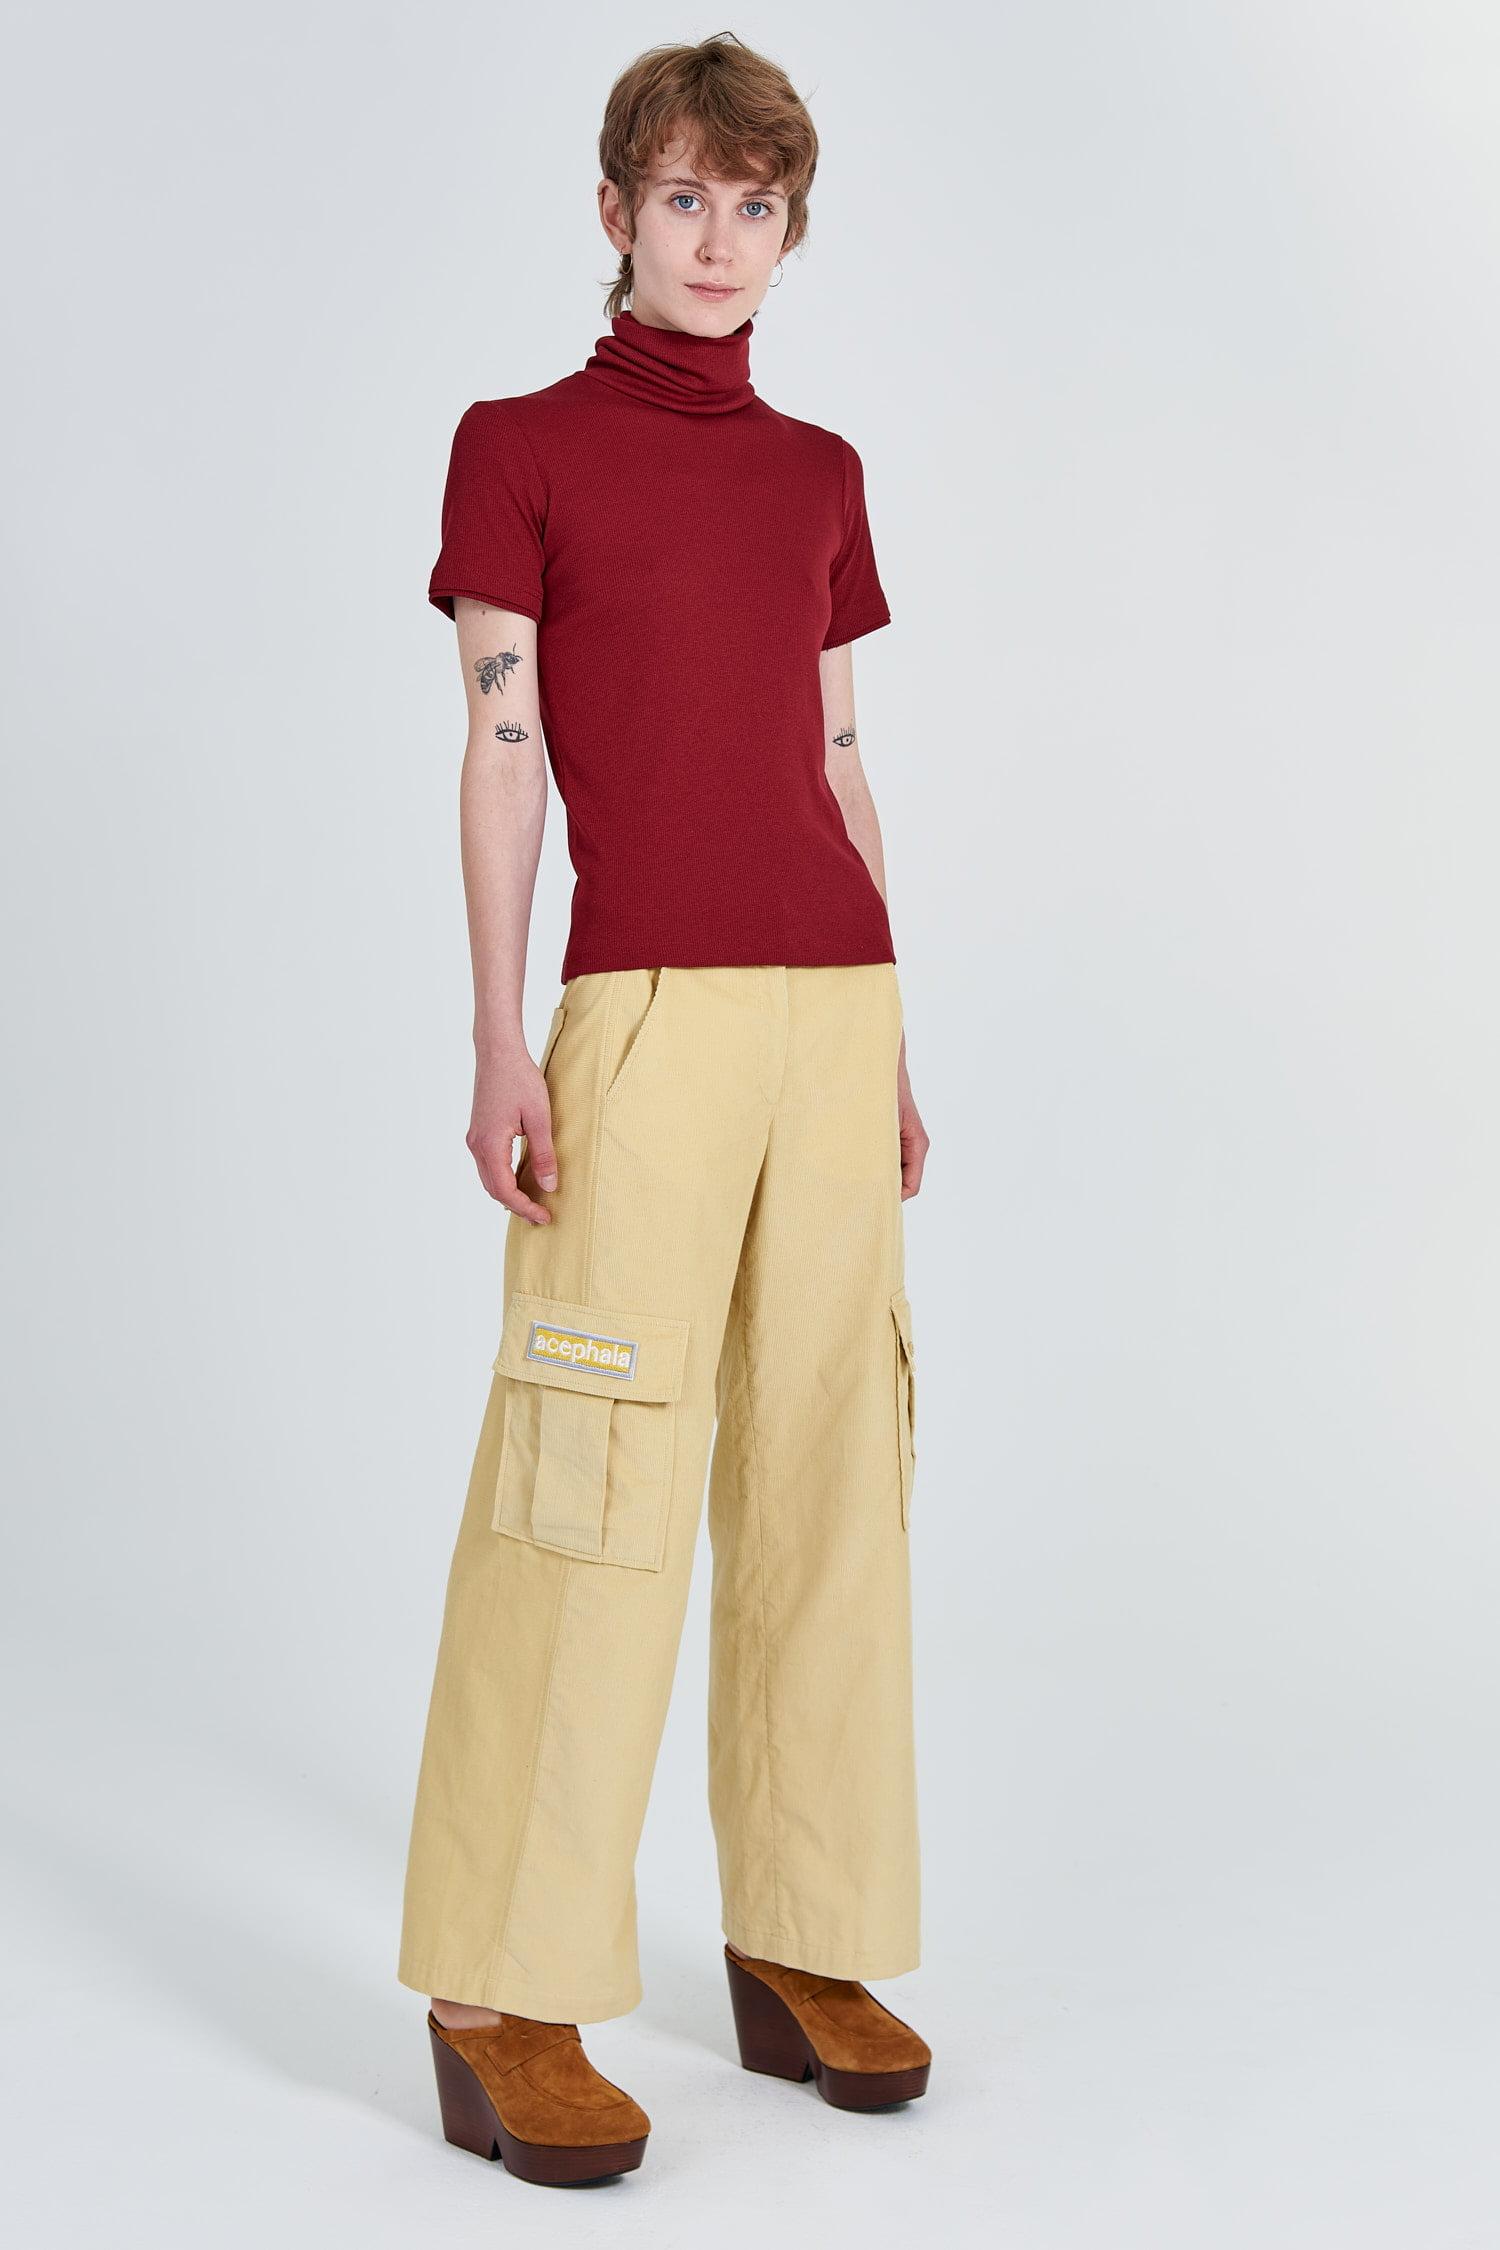 Acephala Fw 2020 21 Yellow Corduroy Trousers Red Turtleneck